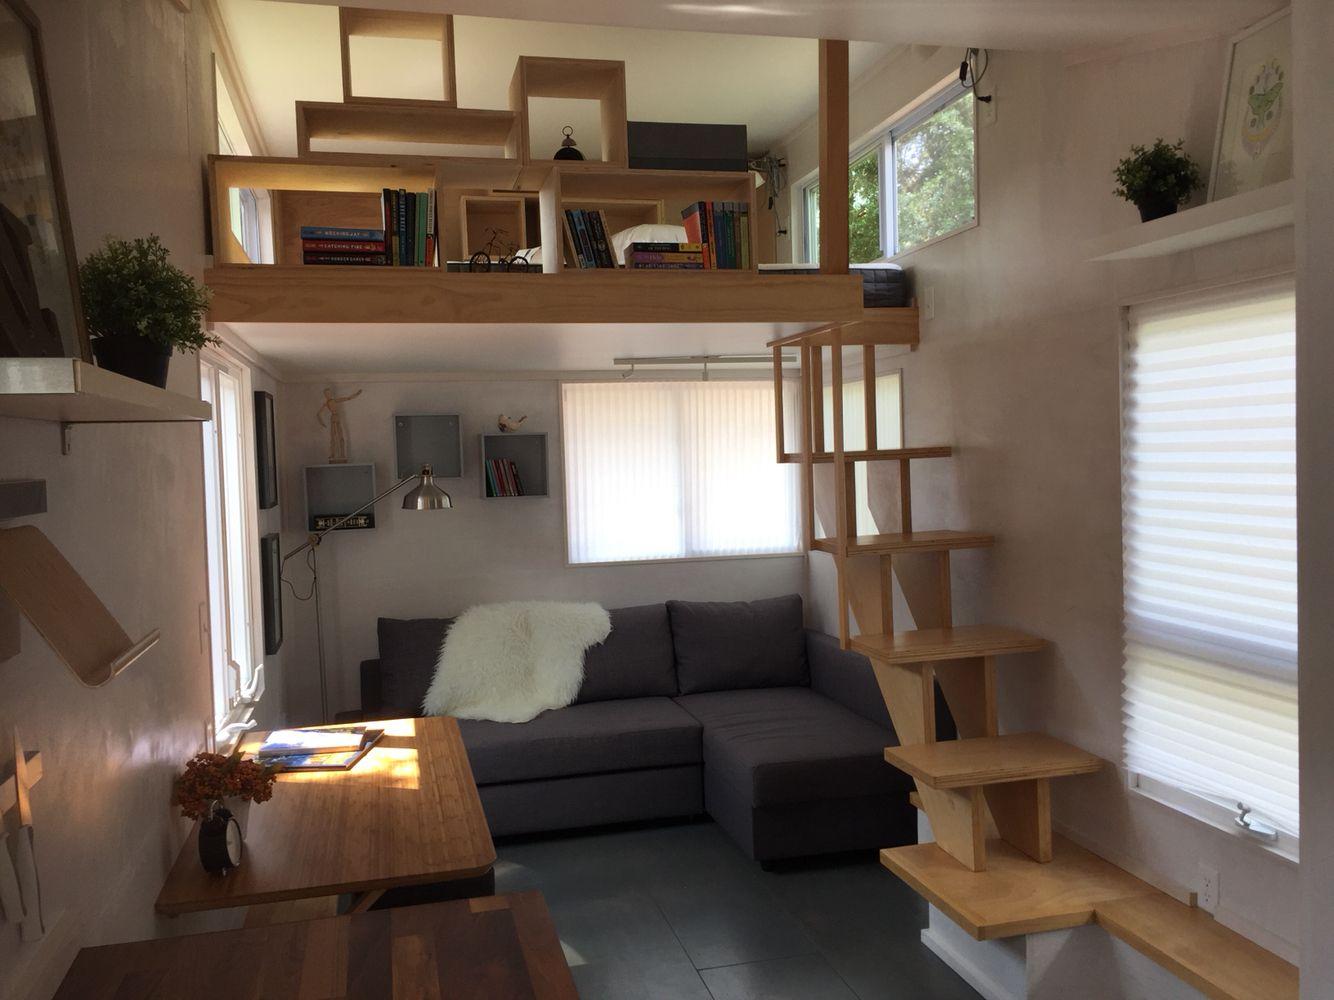 Modern Tiny House On Wheels Loft And Living Room